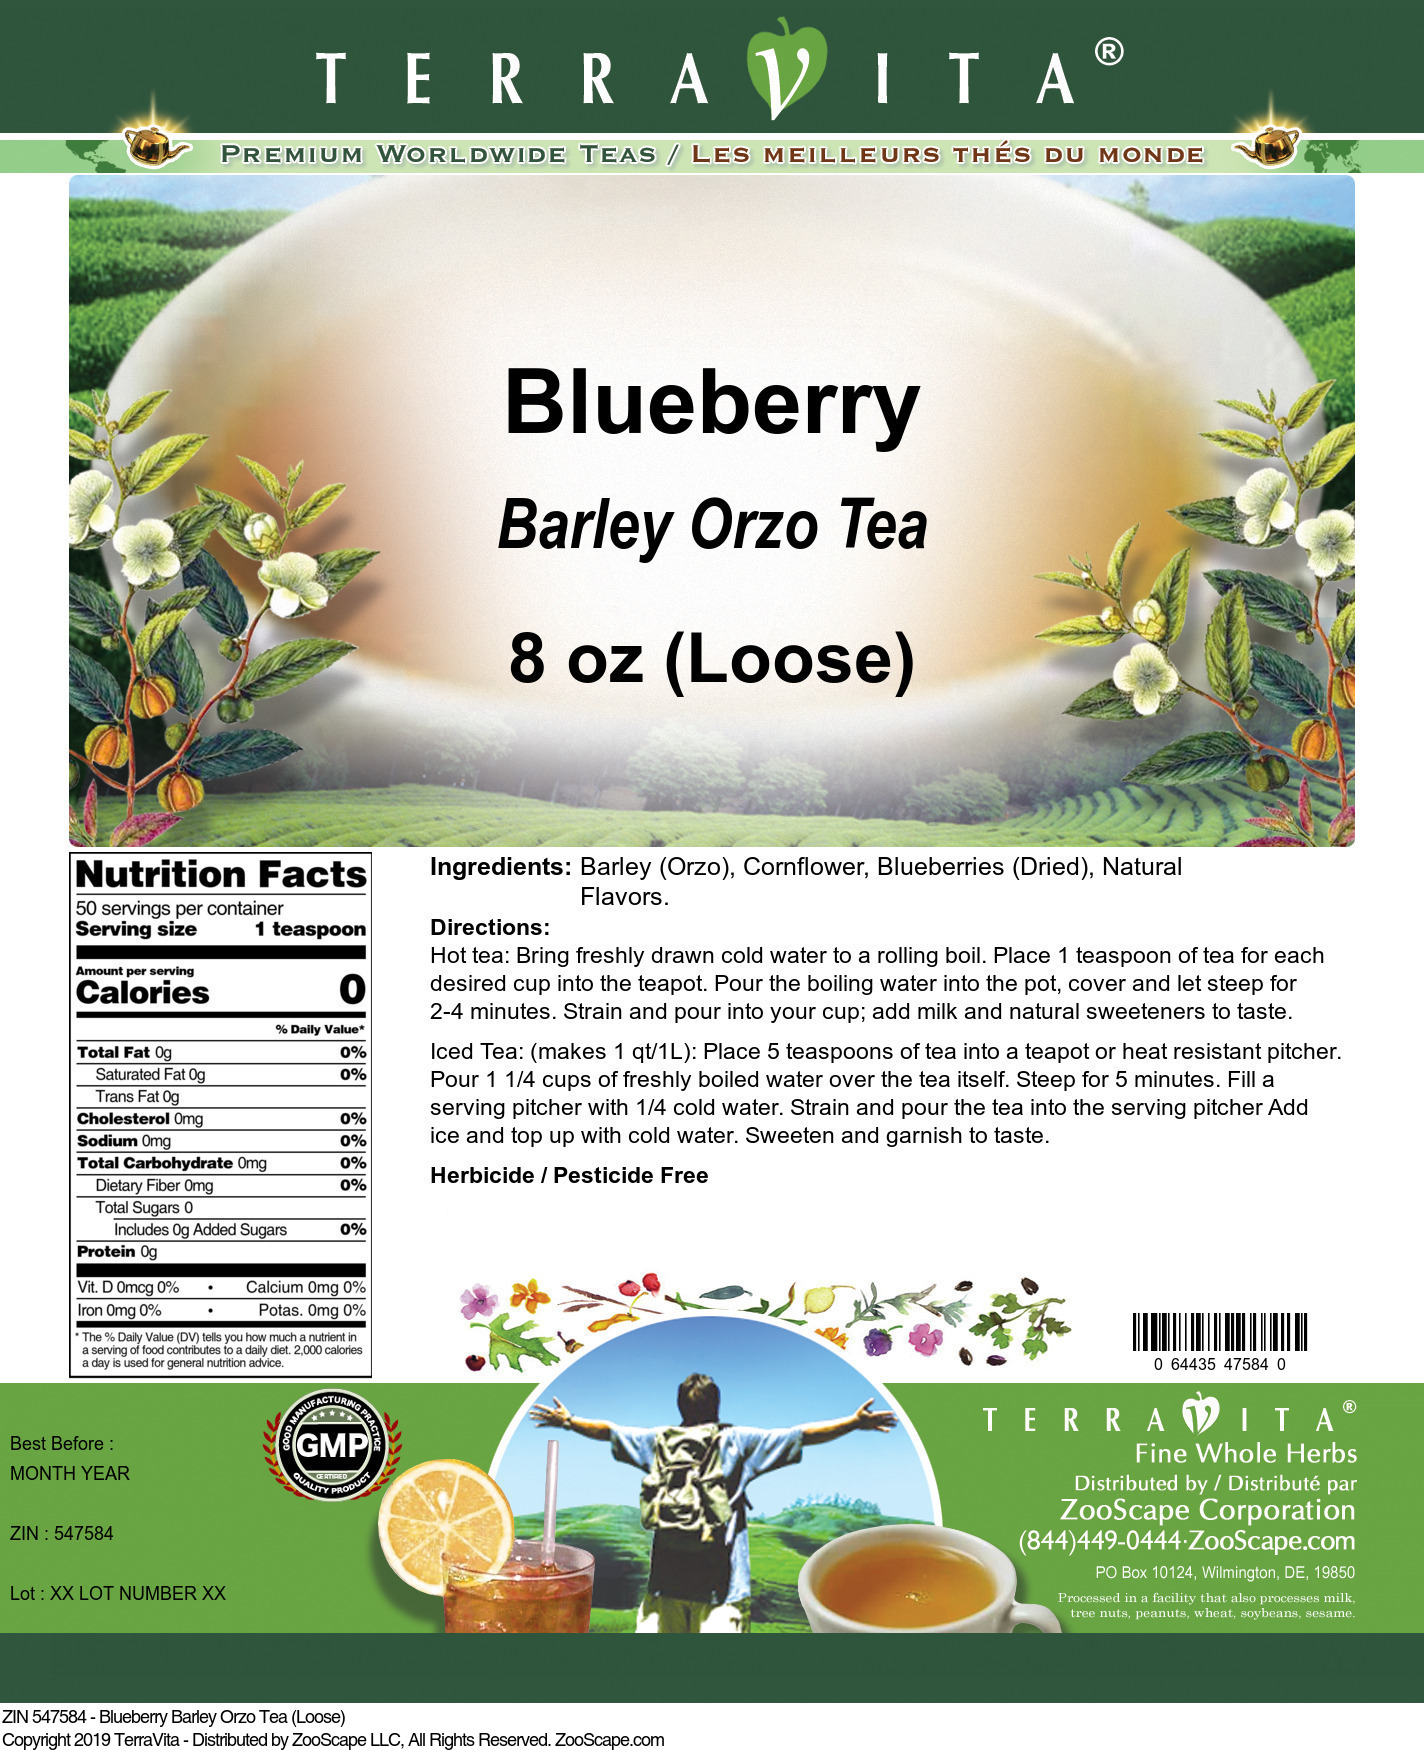 Blueberry Barley Orzo